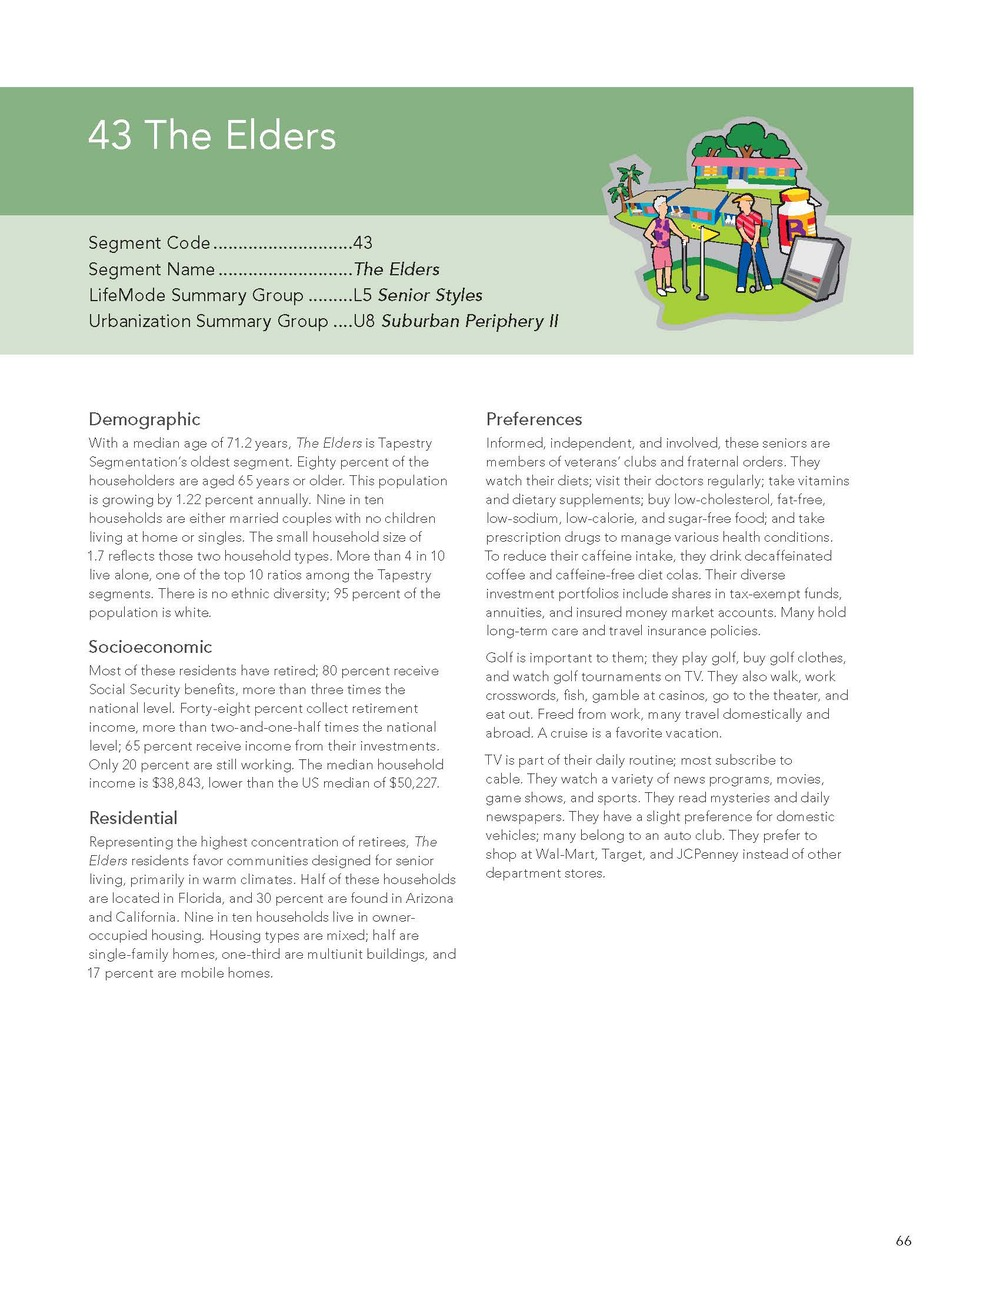 tapestry-segmentation_Page_69.jpg